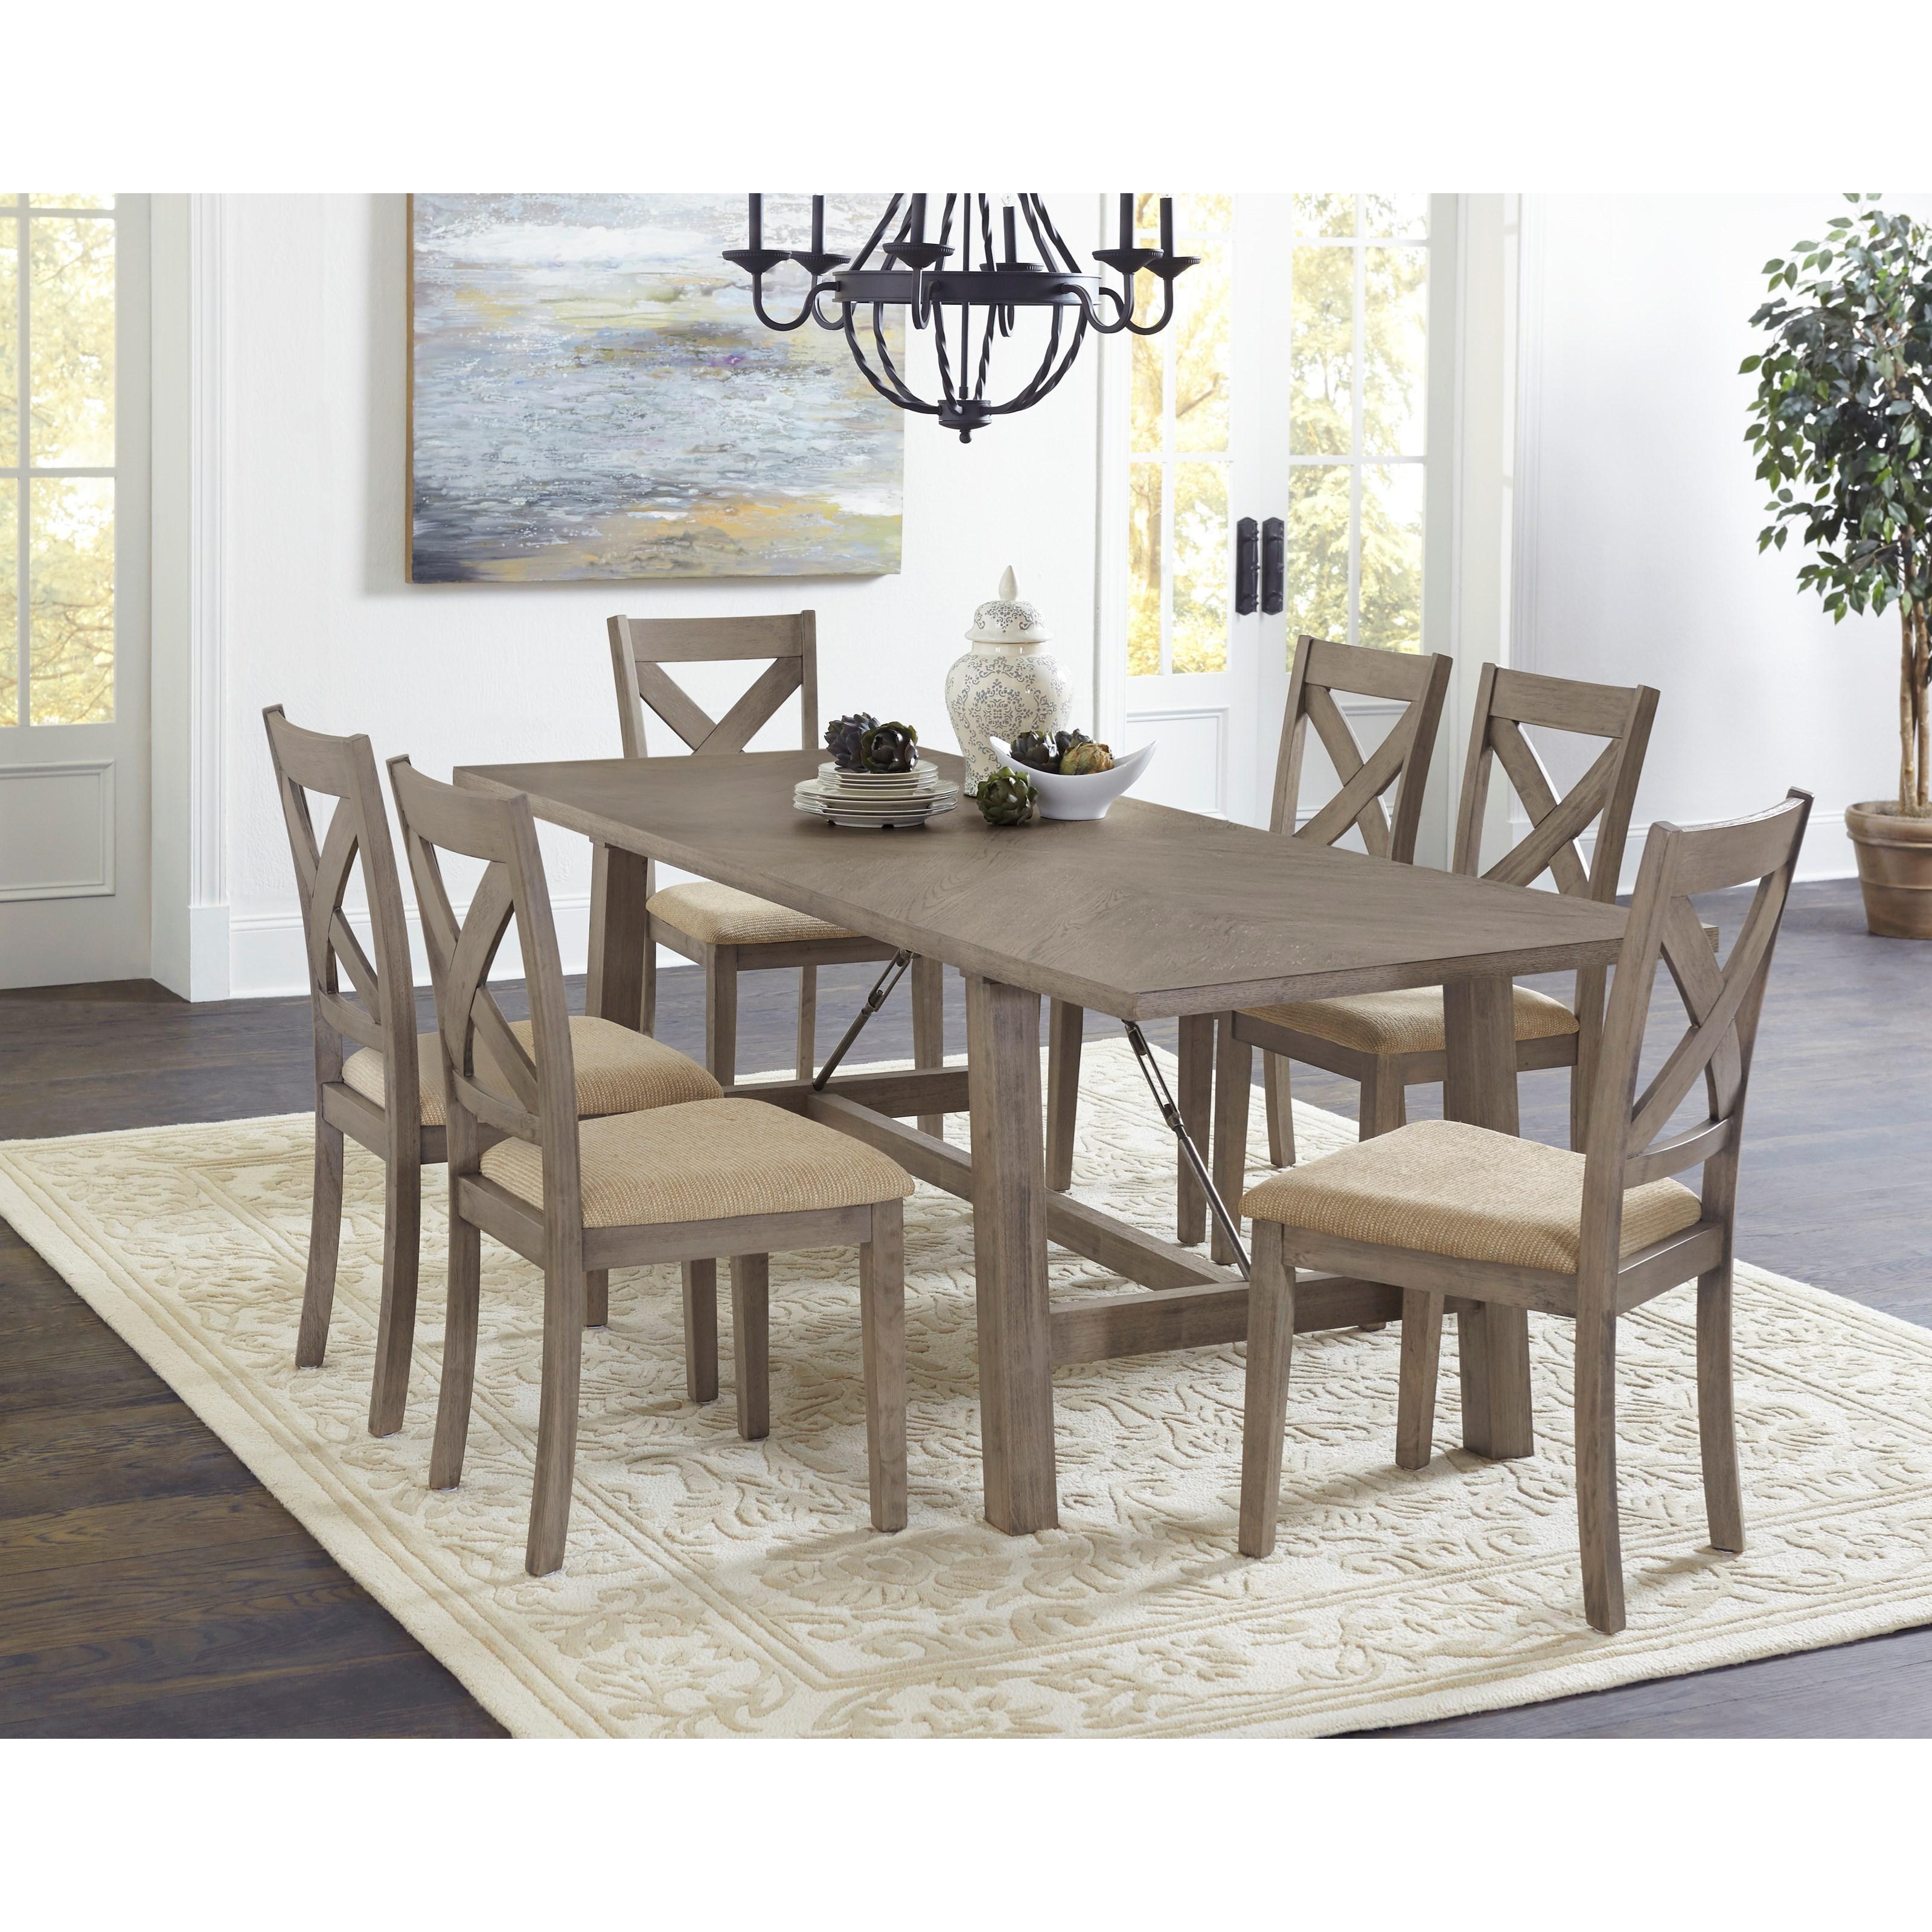 Progressive Furniture Saxton Transitional 6 Piece Dining Set With